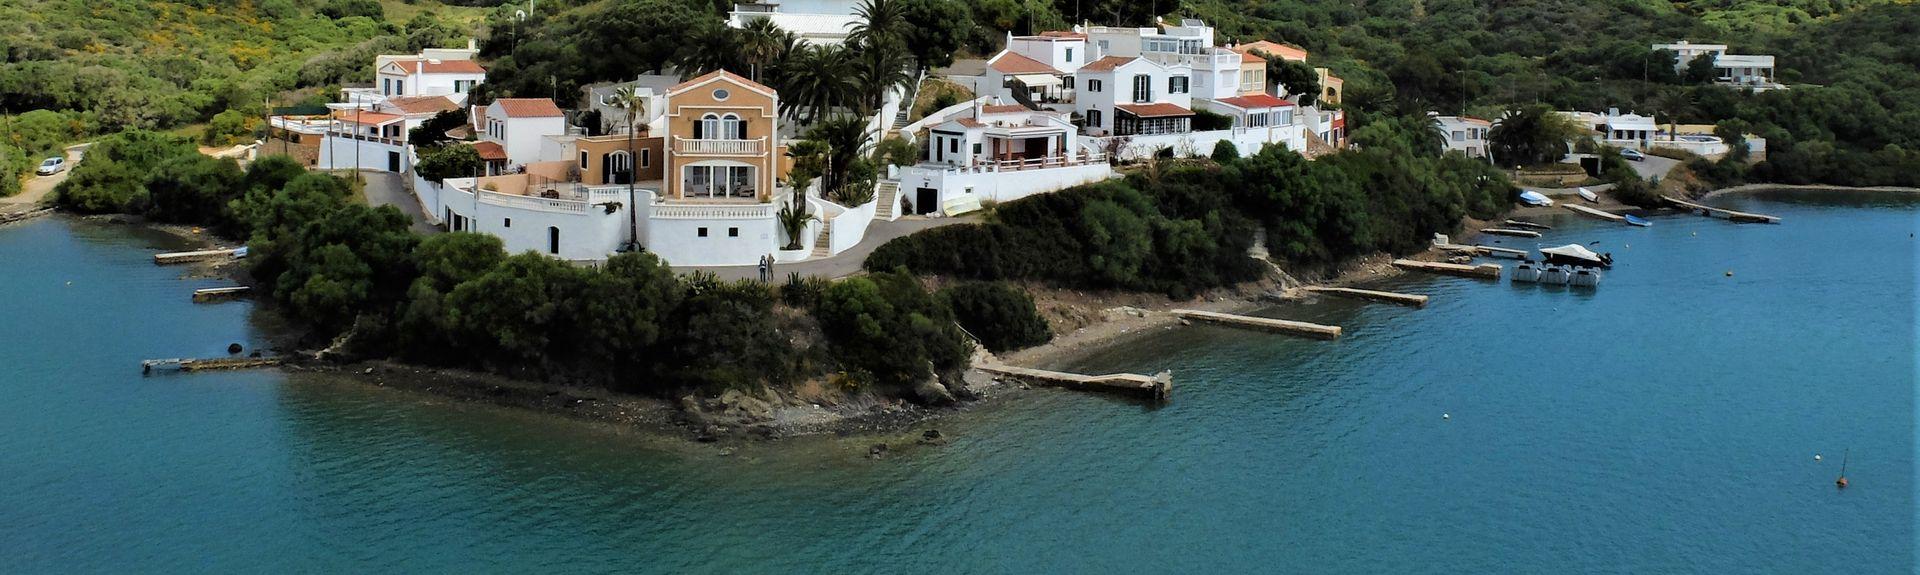 Es Canutells, Mahon, Balearen, Spanje